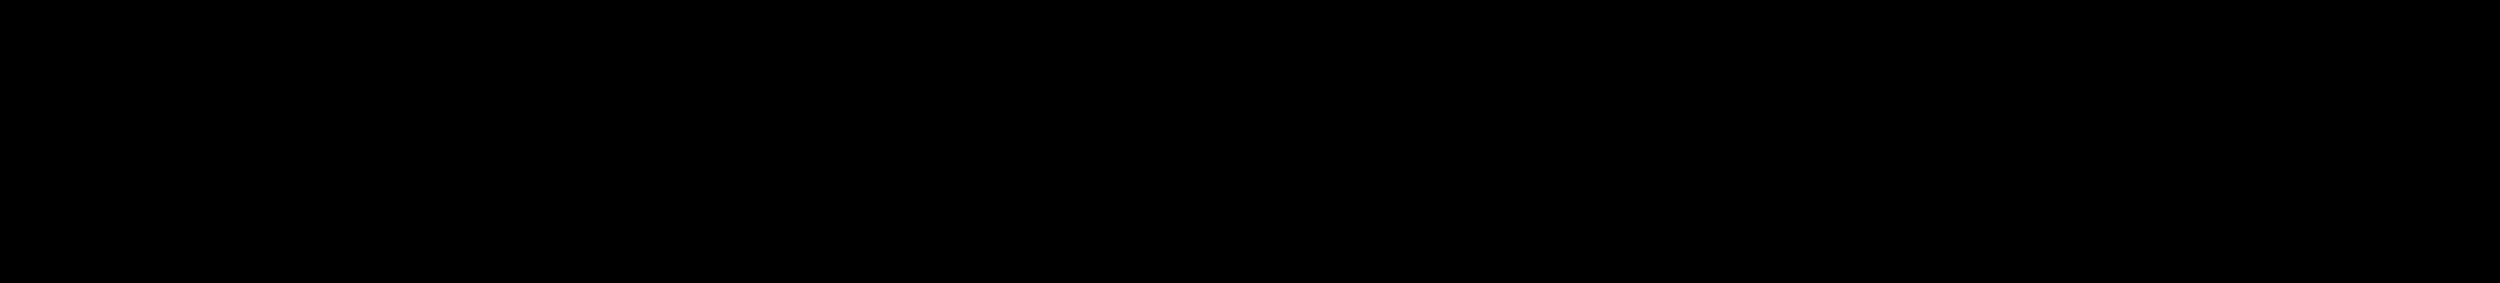 web-assets-titleArtboard-7.png